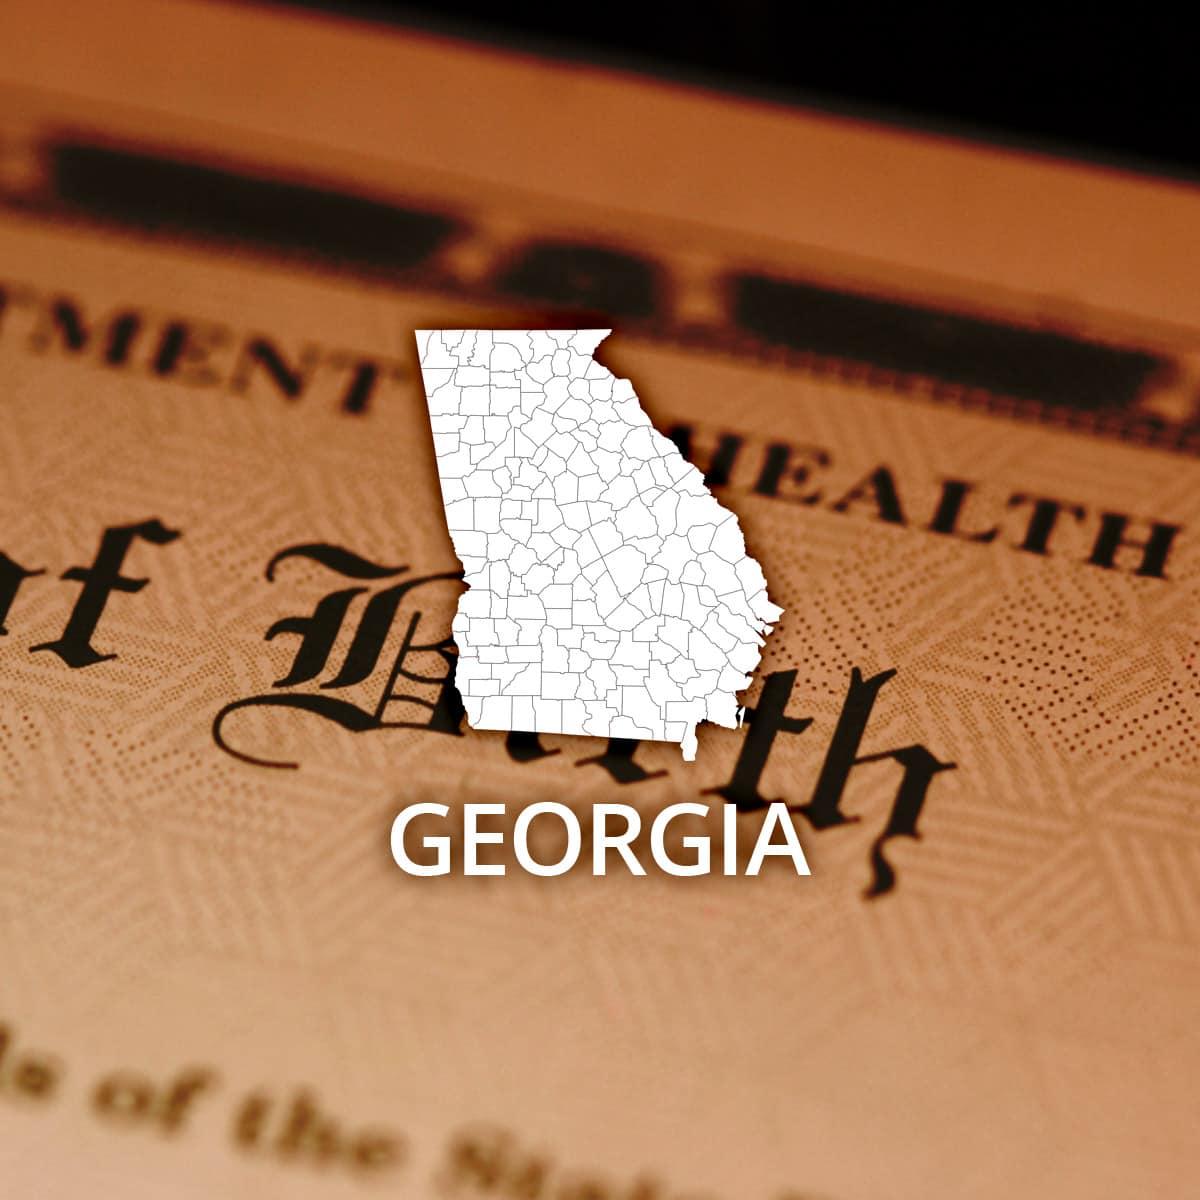 Where to Obtain a Georgia Birth Certificate